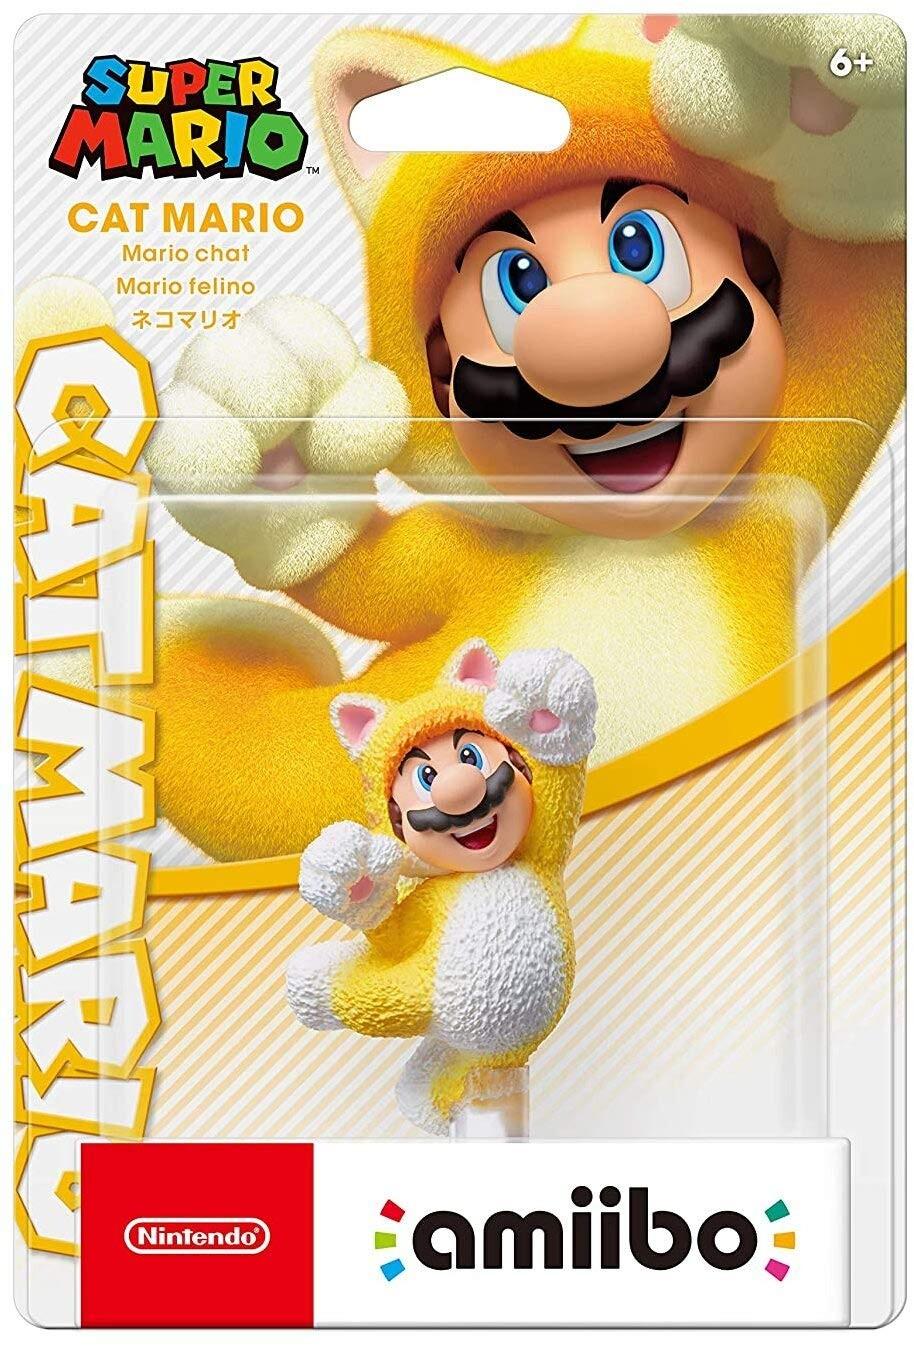 Super Mario Series: Интерактивная фигурка amiibo - Cat Mario